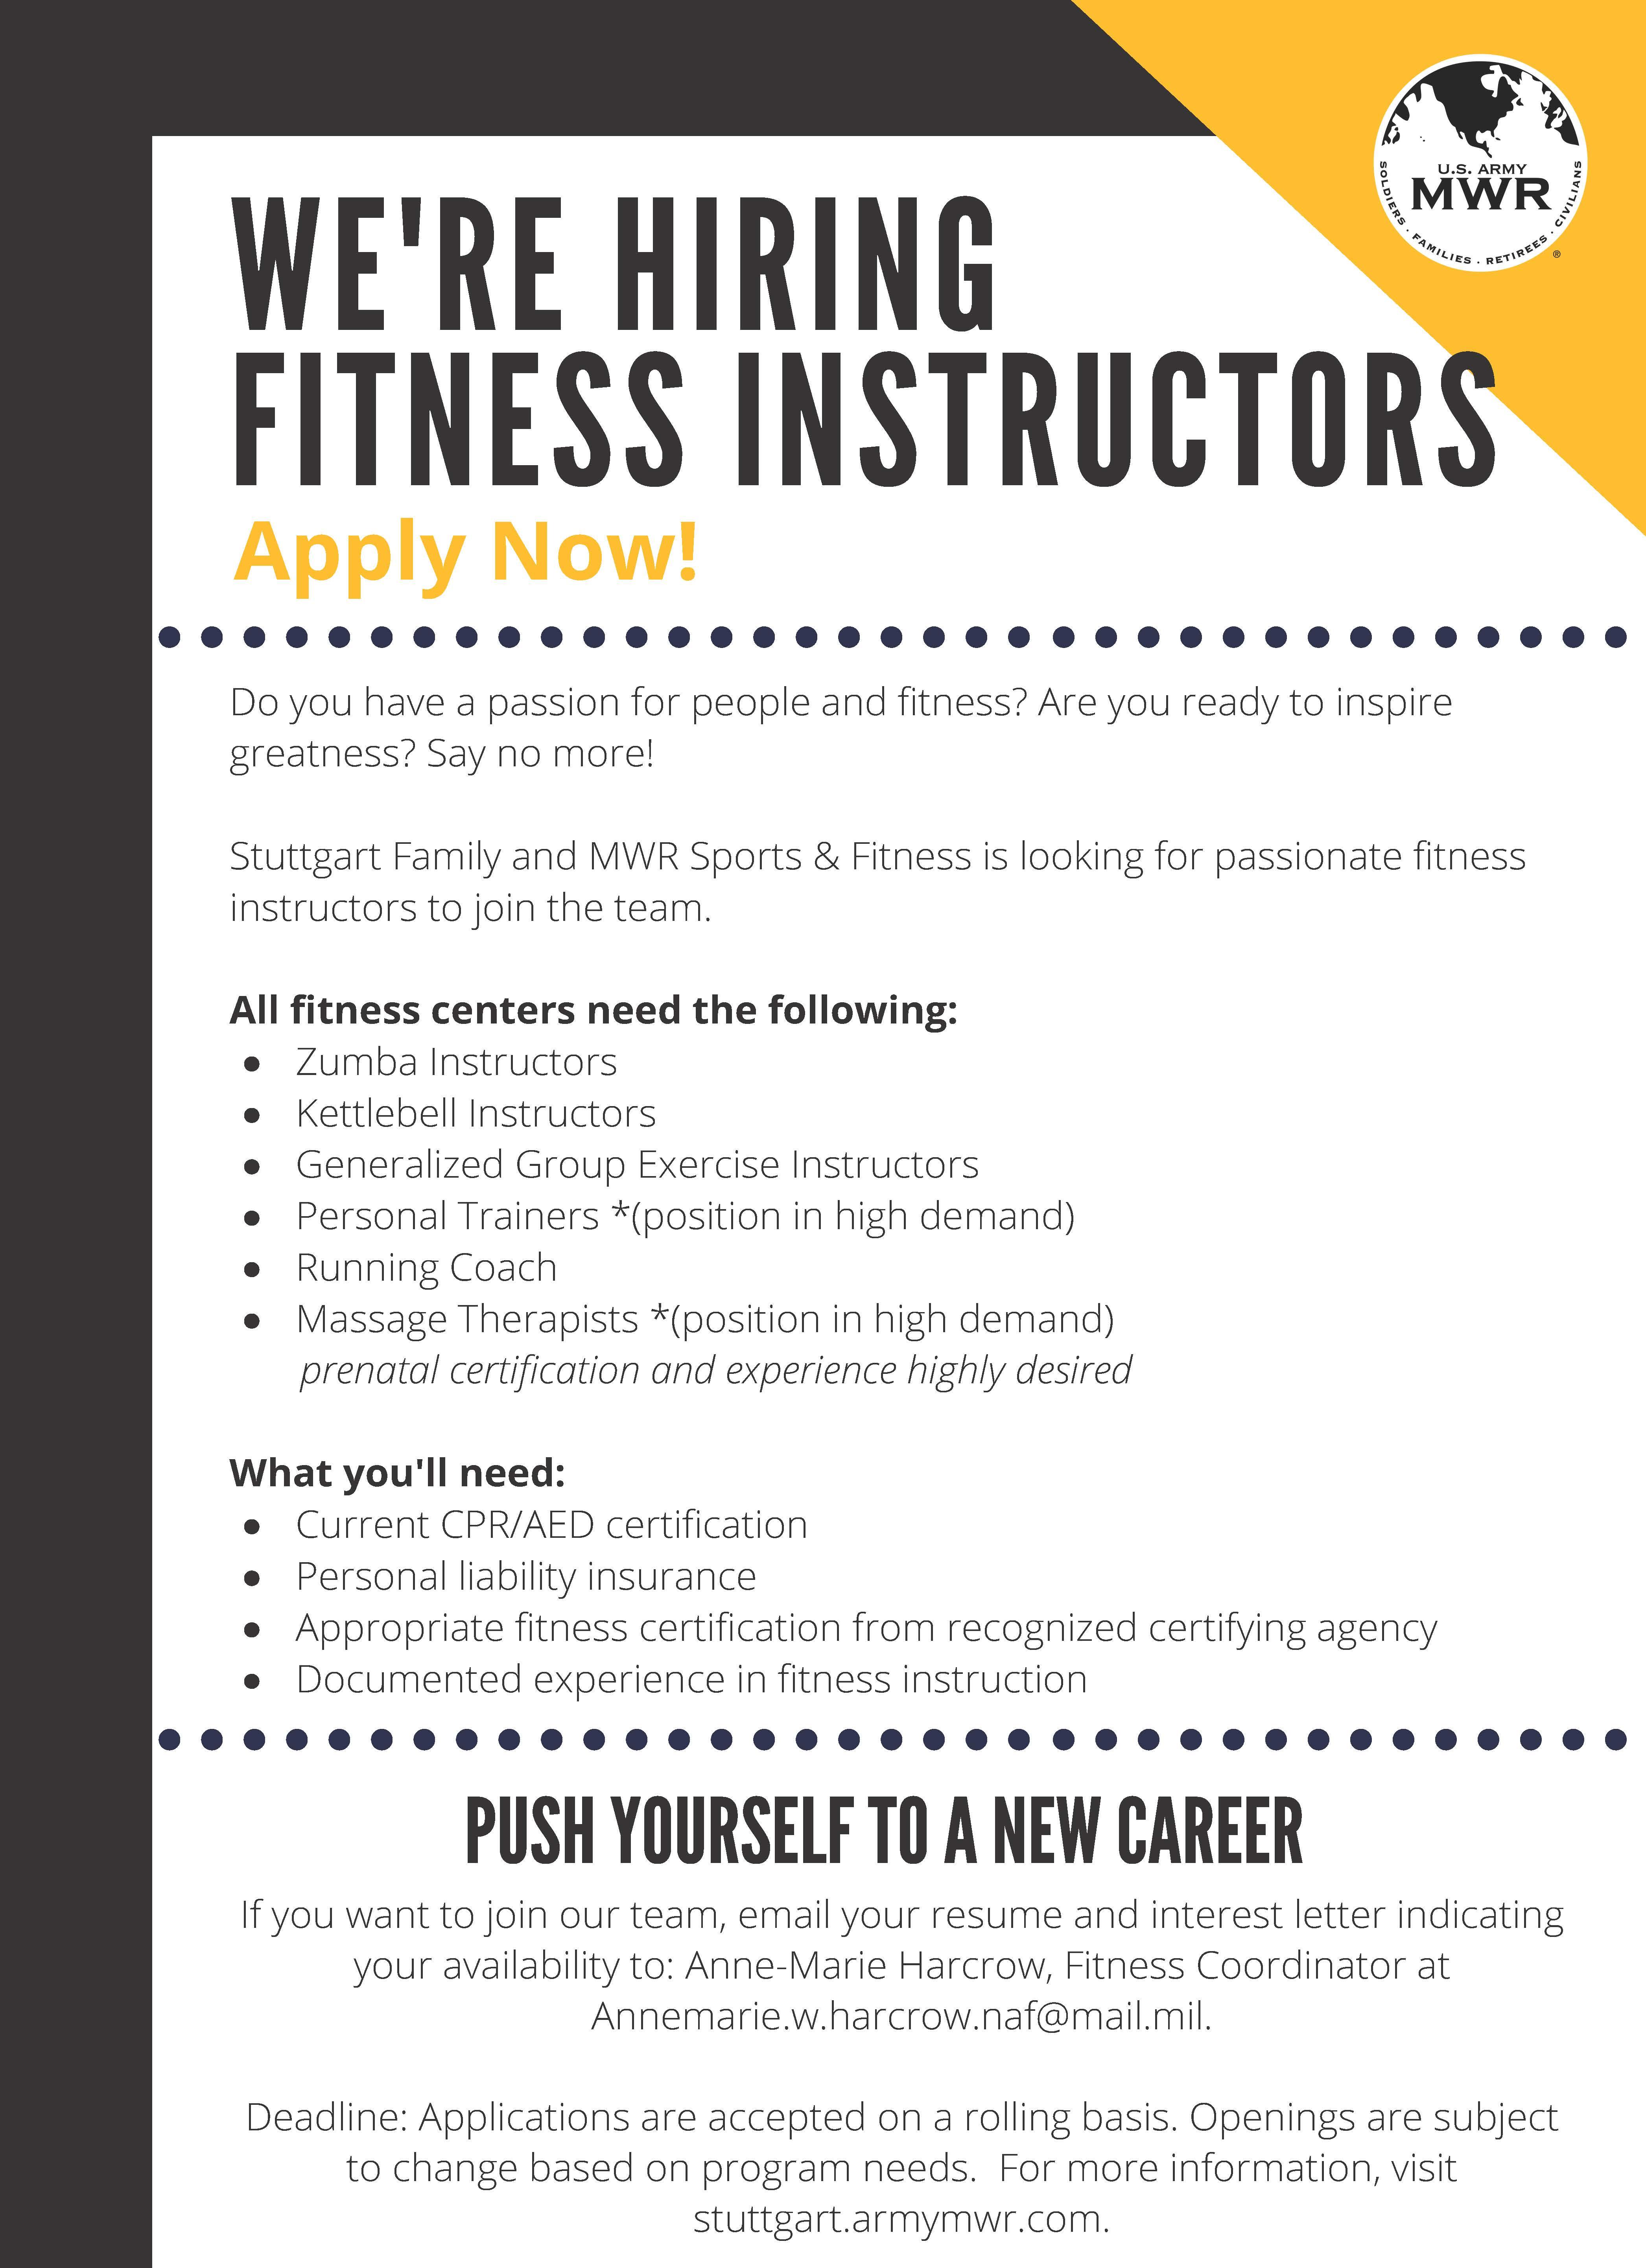 We're hiring fitness instructors B.jpg